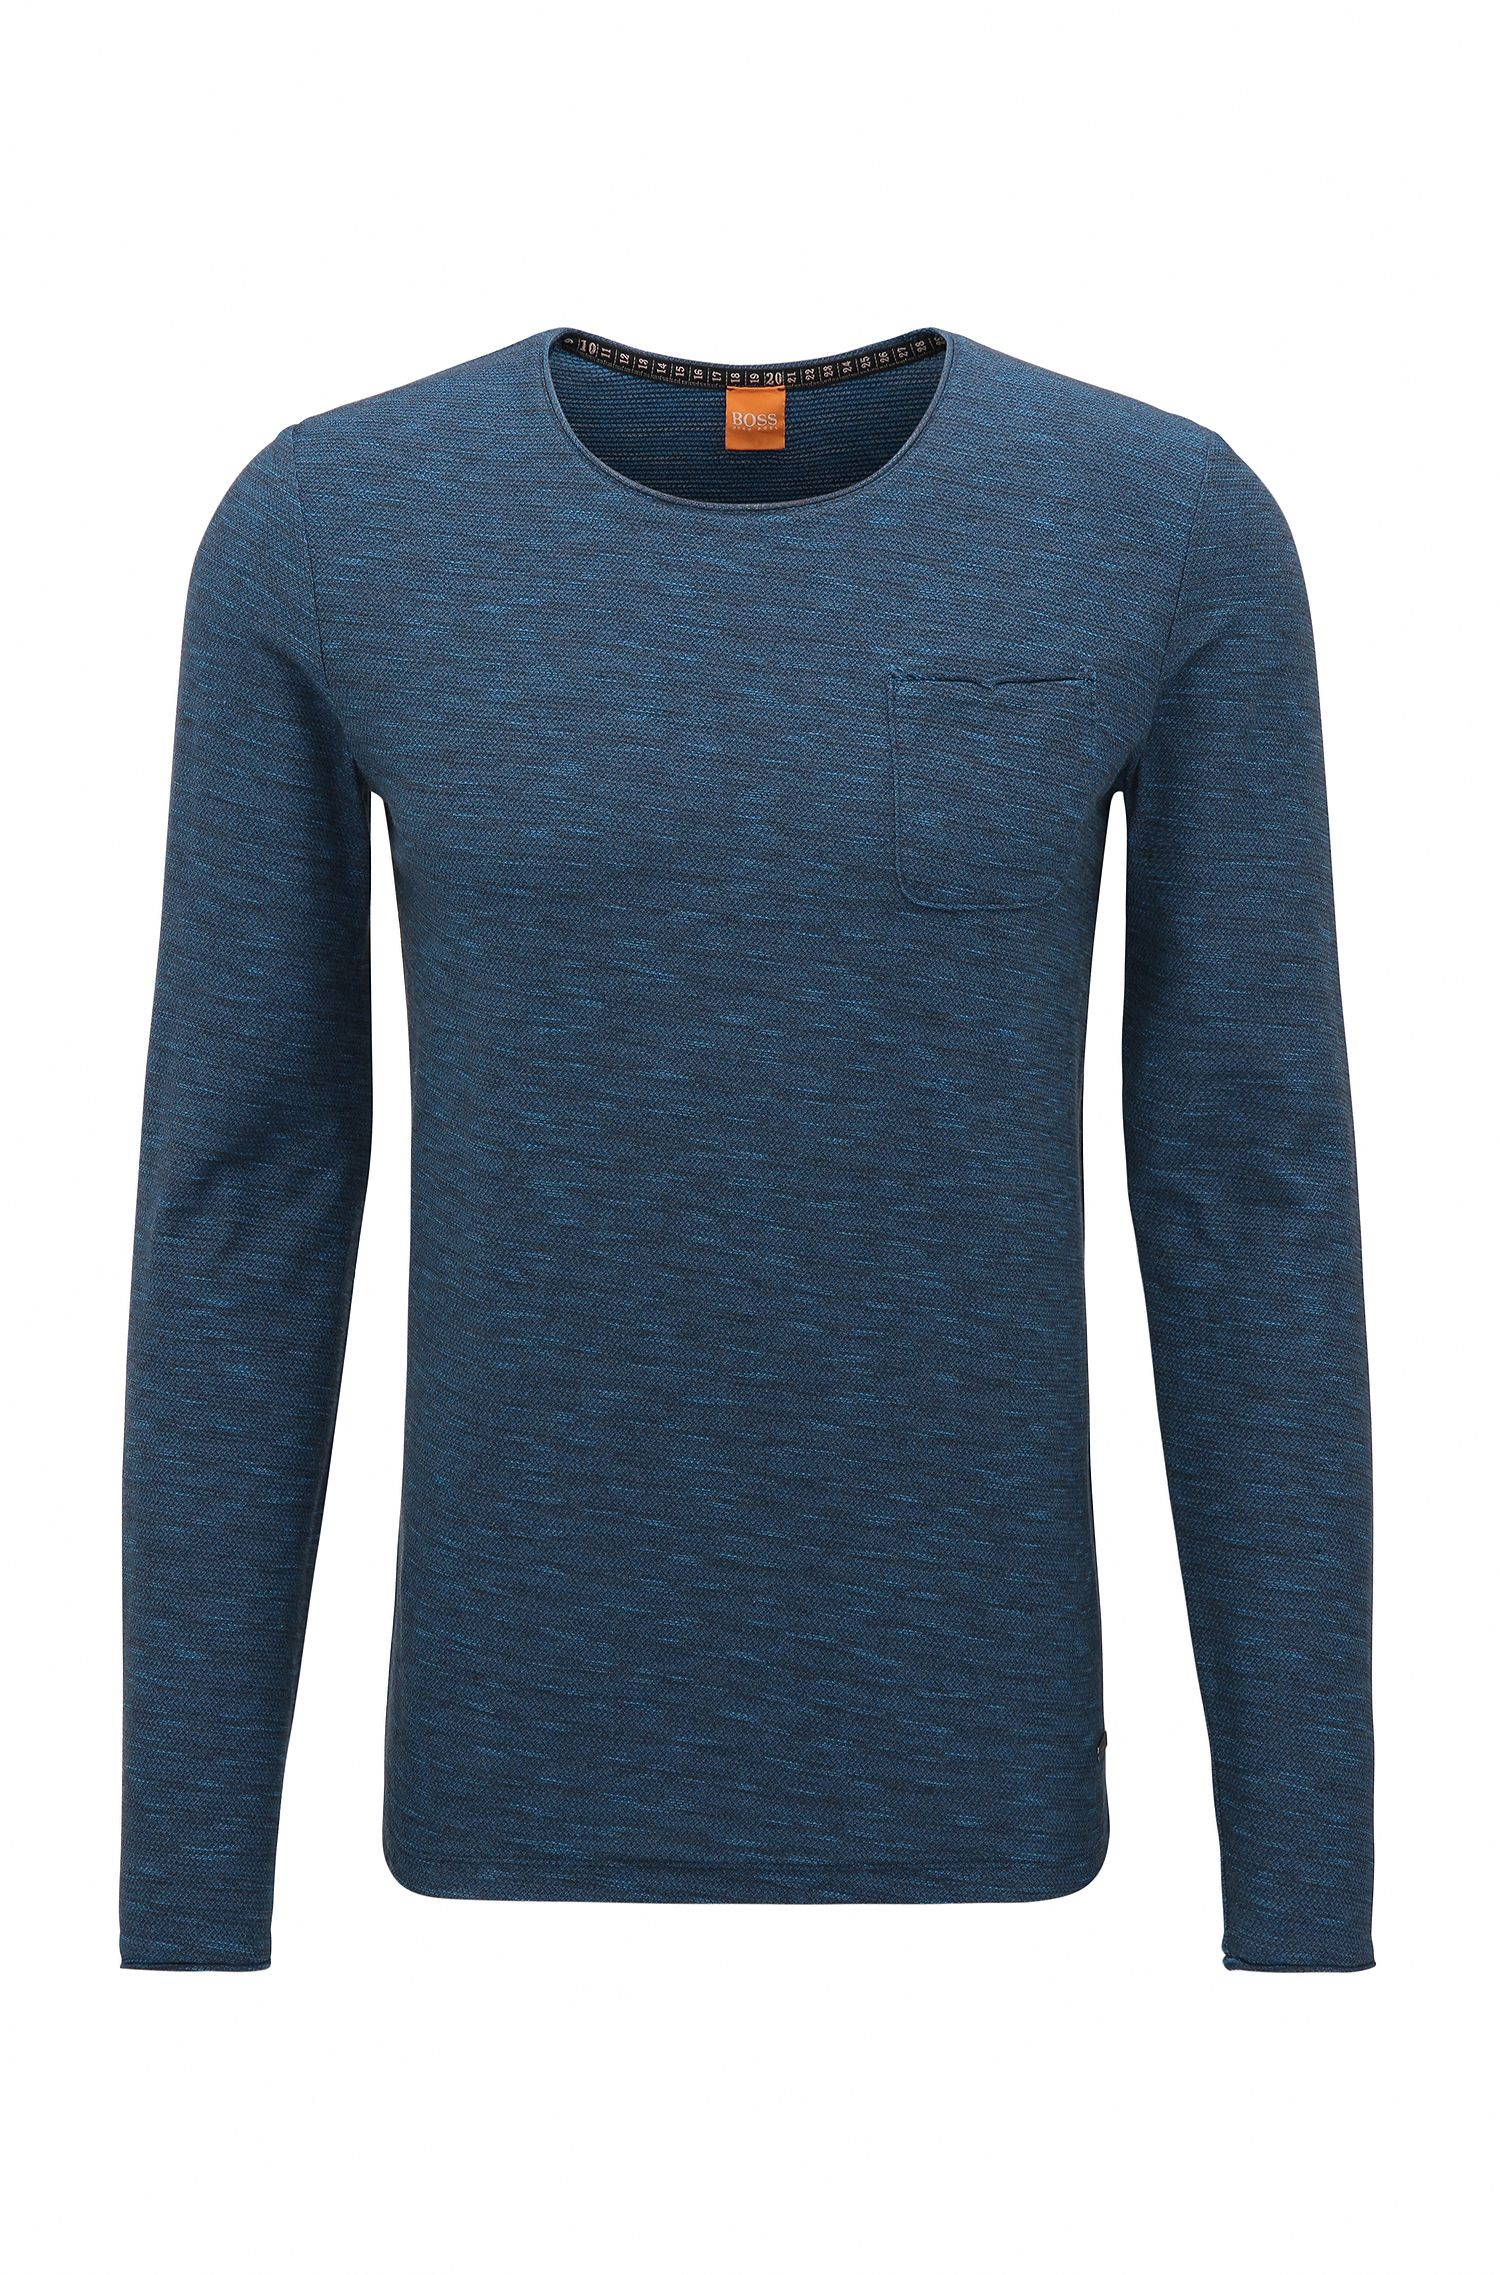 Melange Cotton Long Sleeve T-Shirt | Types